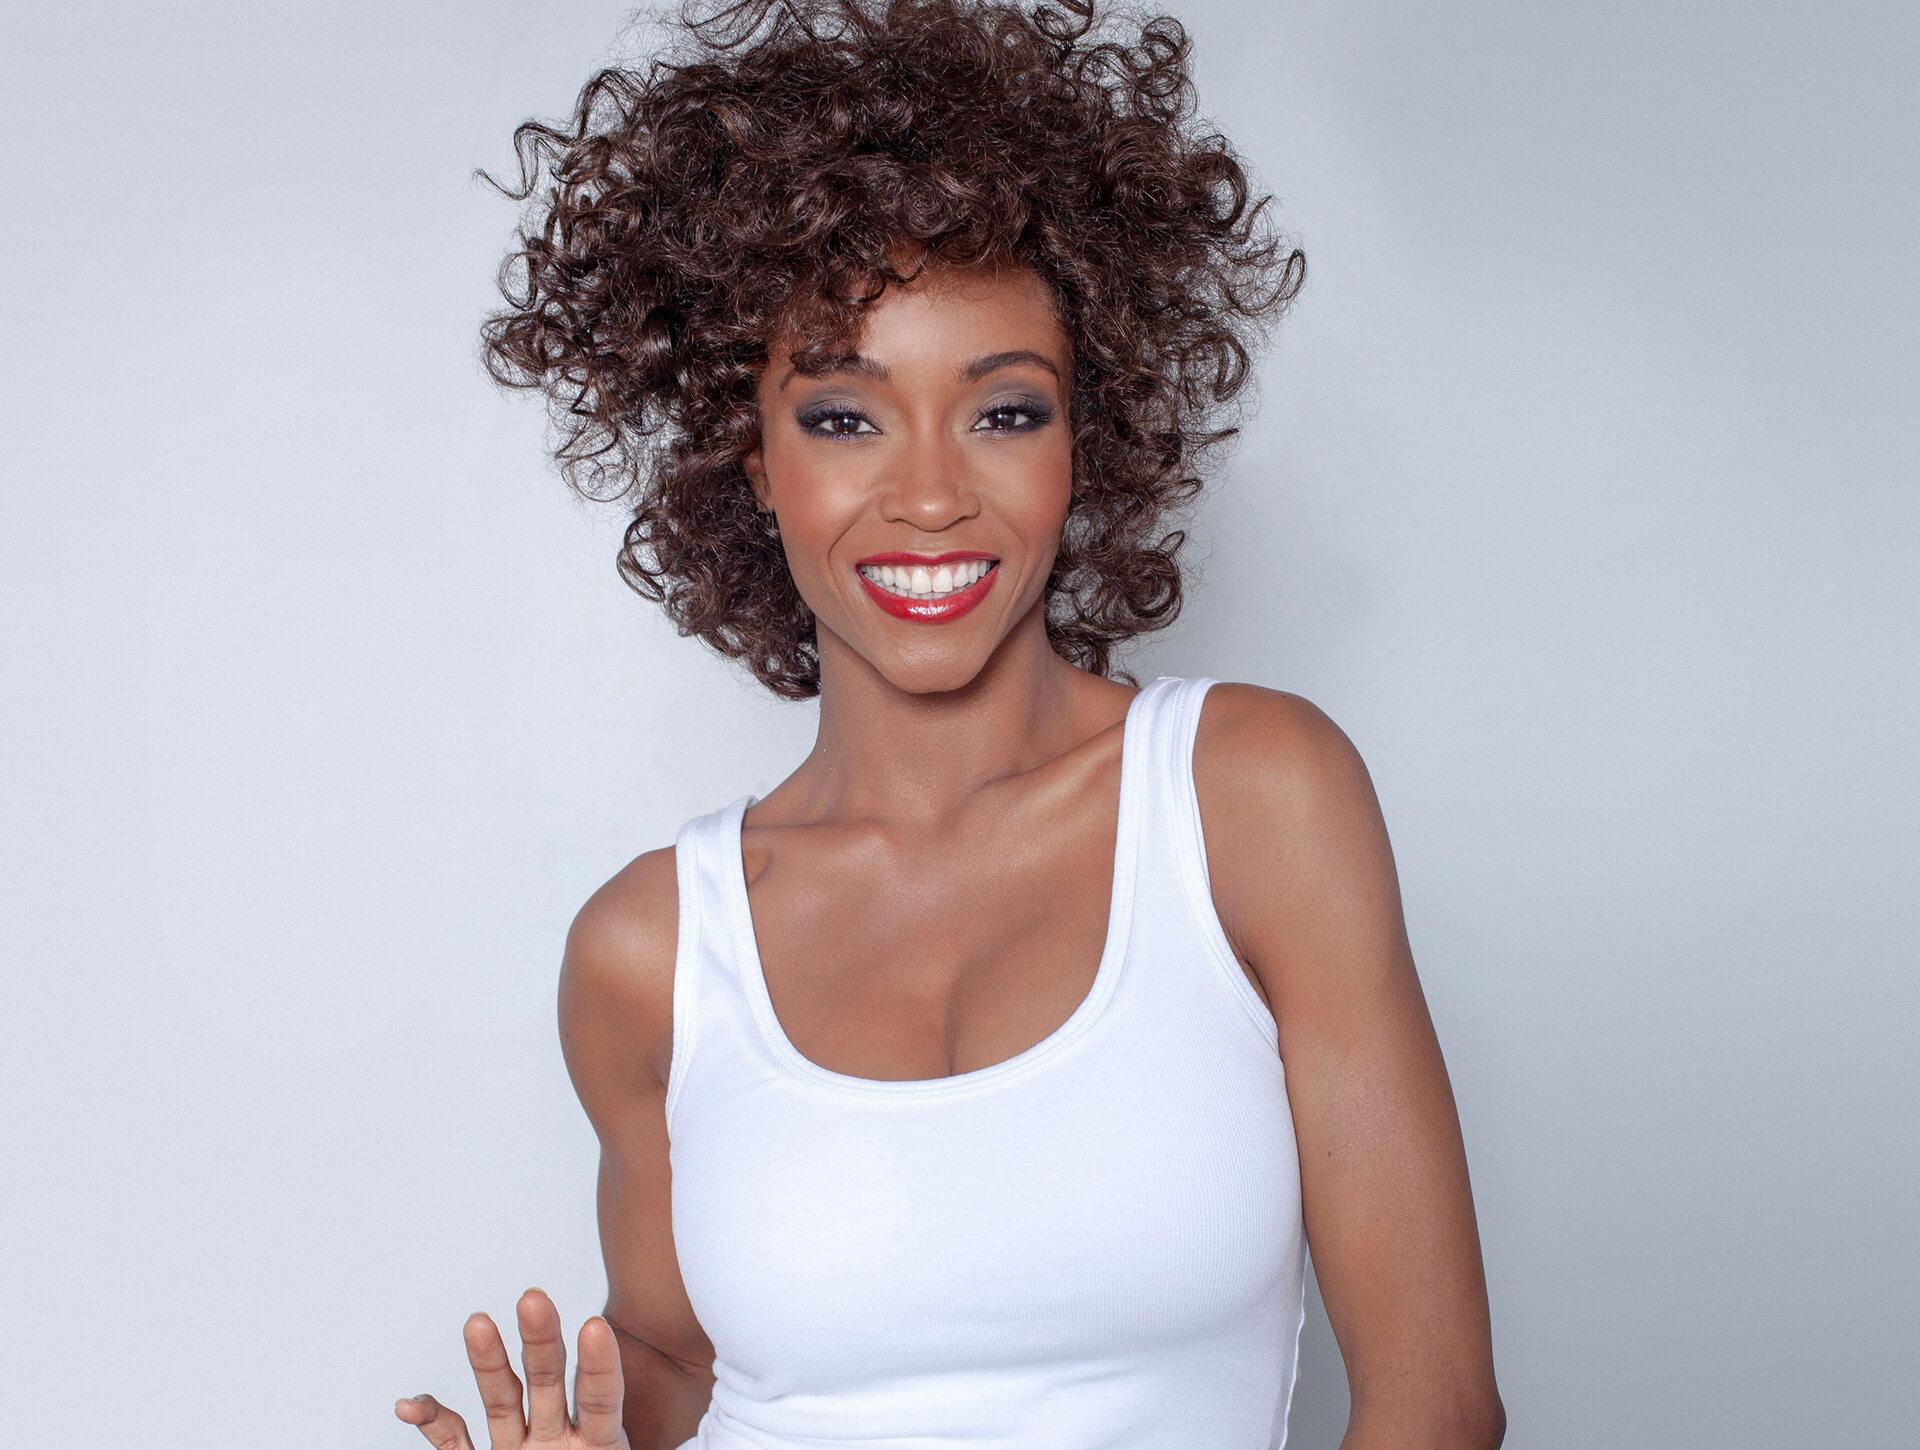 YaYa DaCosta jako Whitney Houston